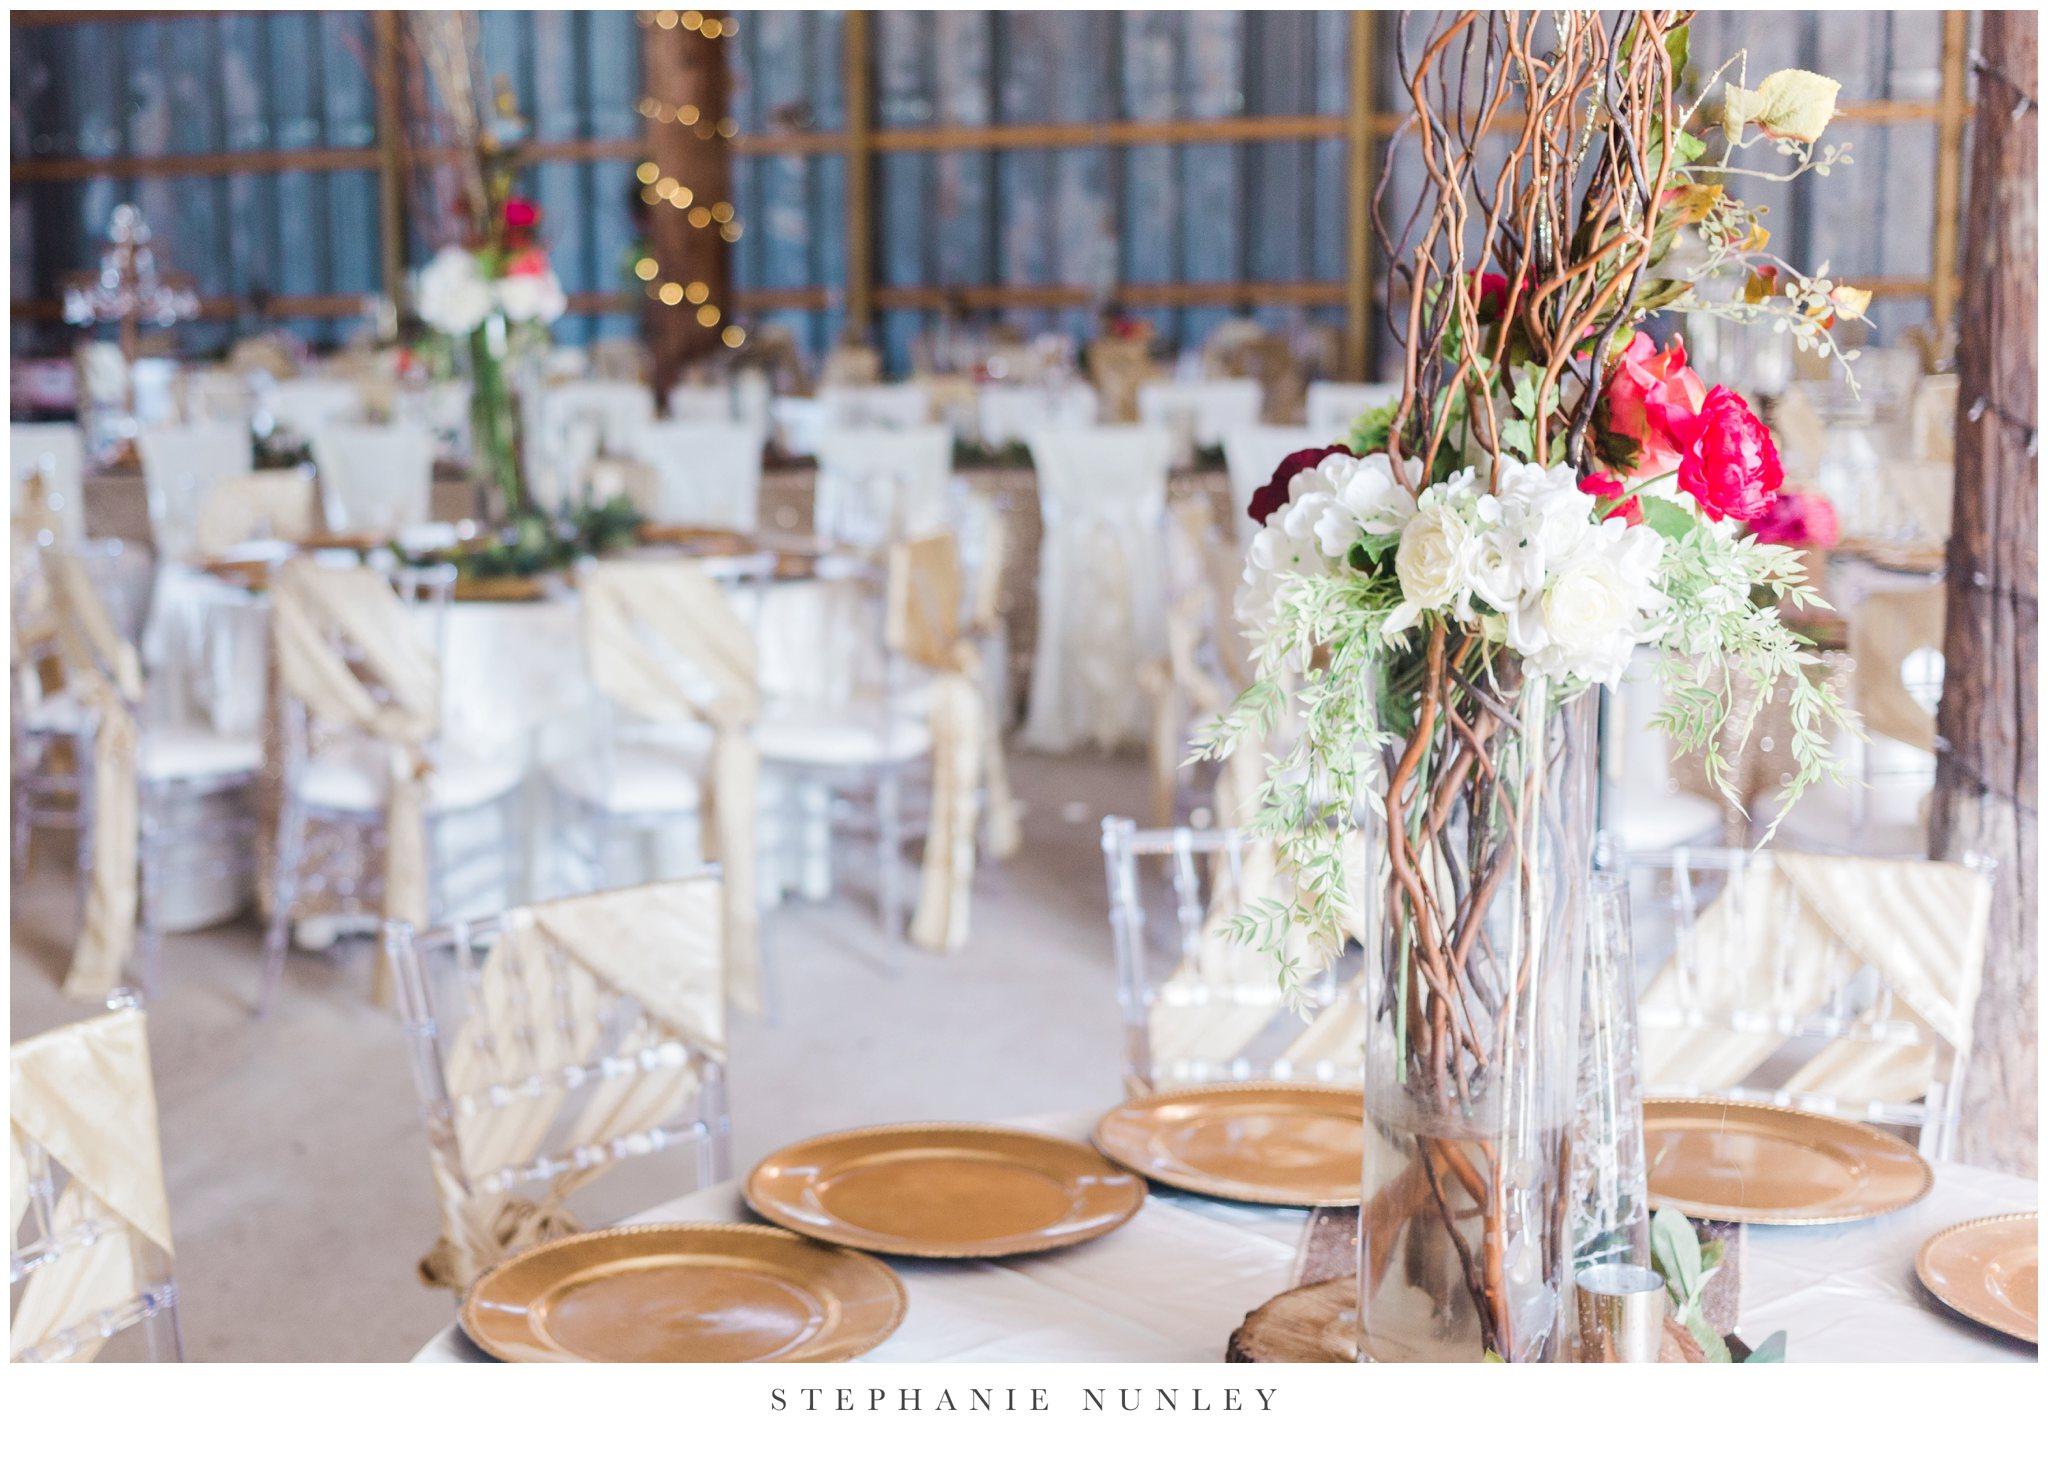 romantic-outdoor-wedding-with-flower-crown-0106.jpg